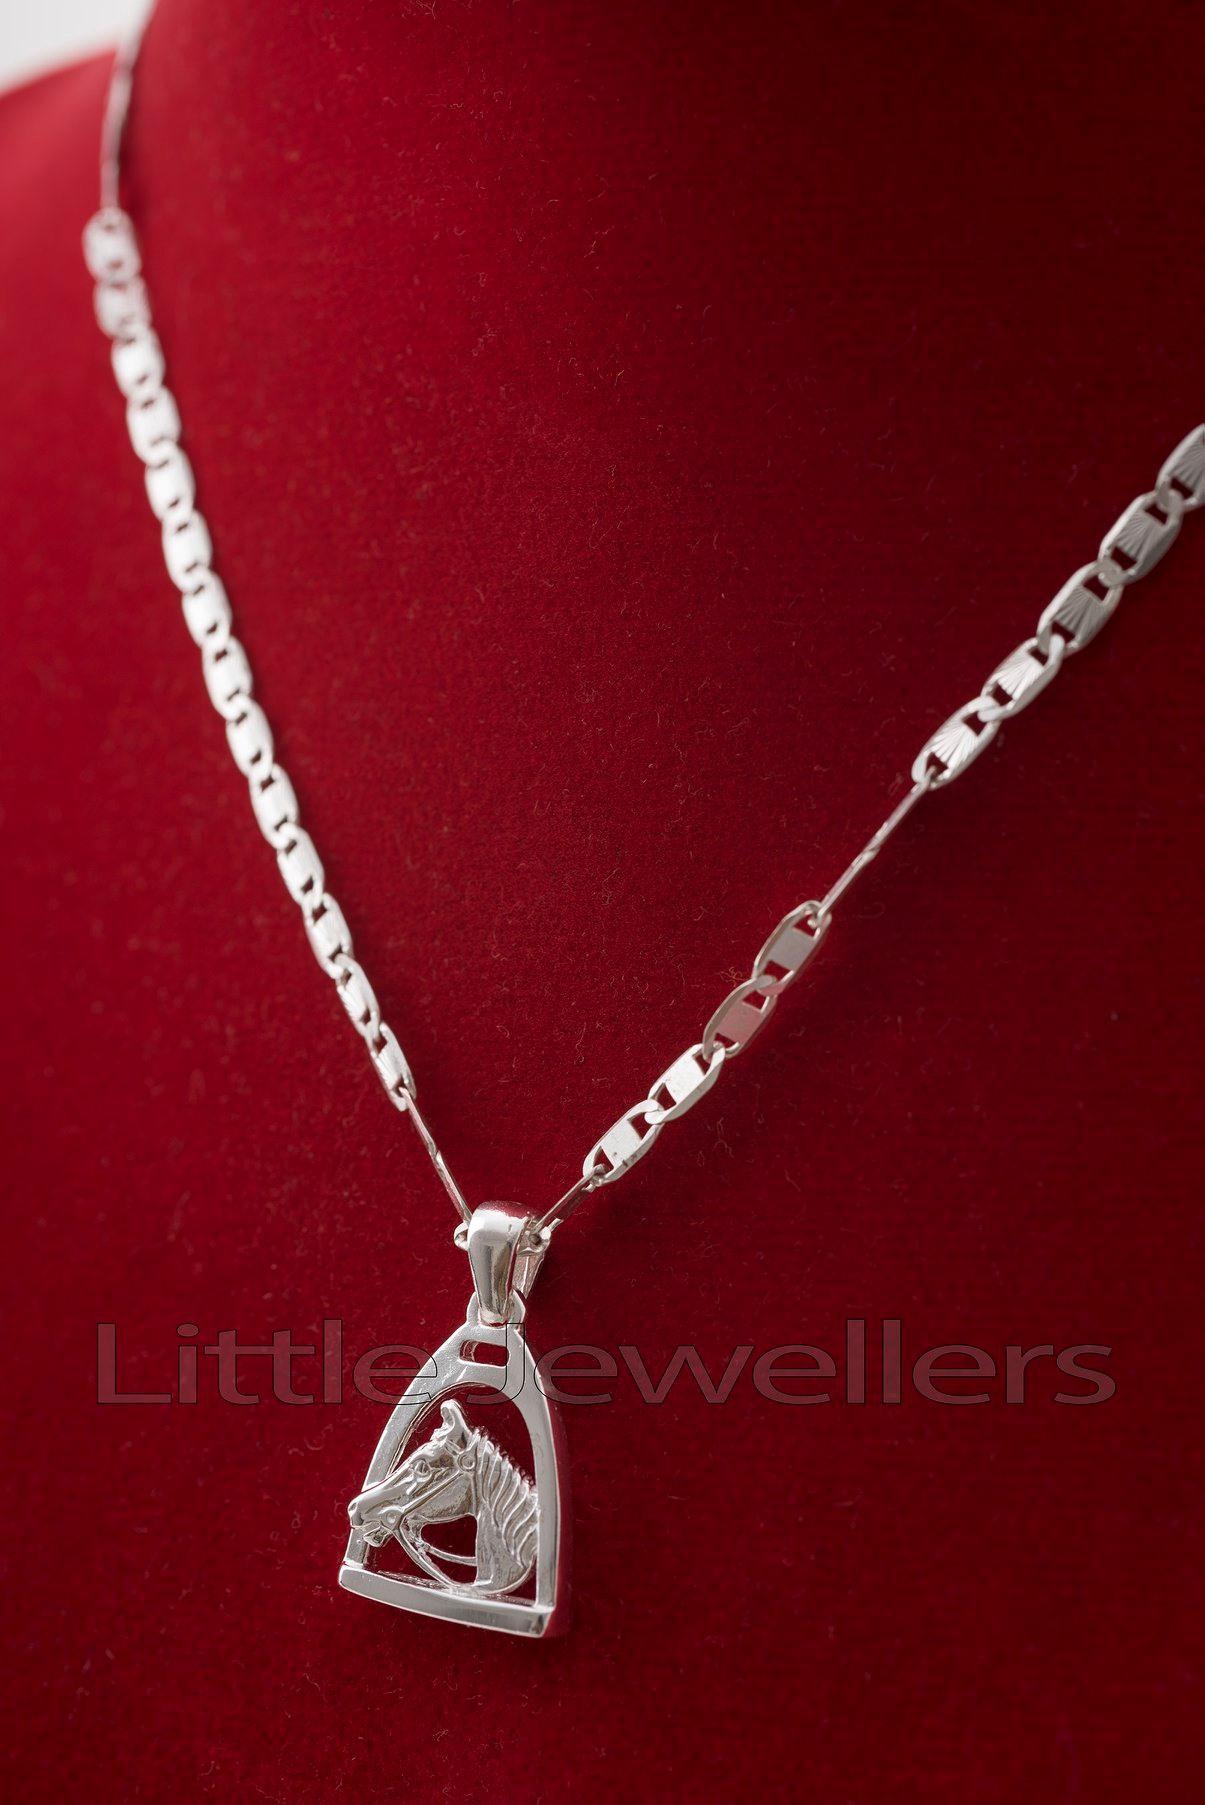 A creative and unique silver horse necklace